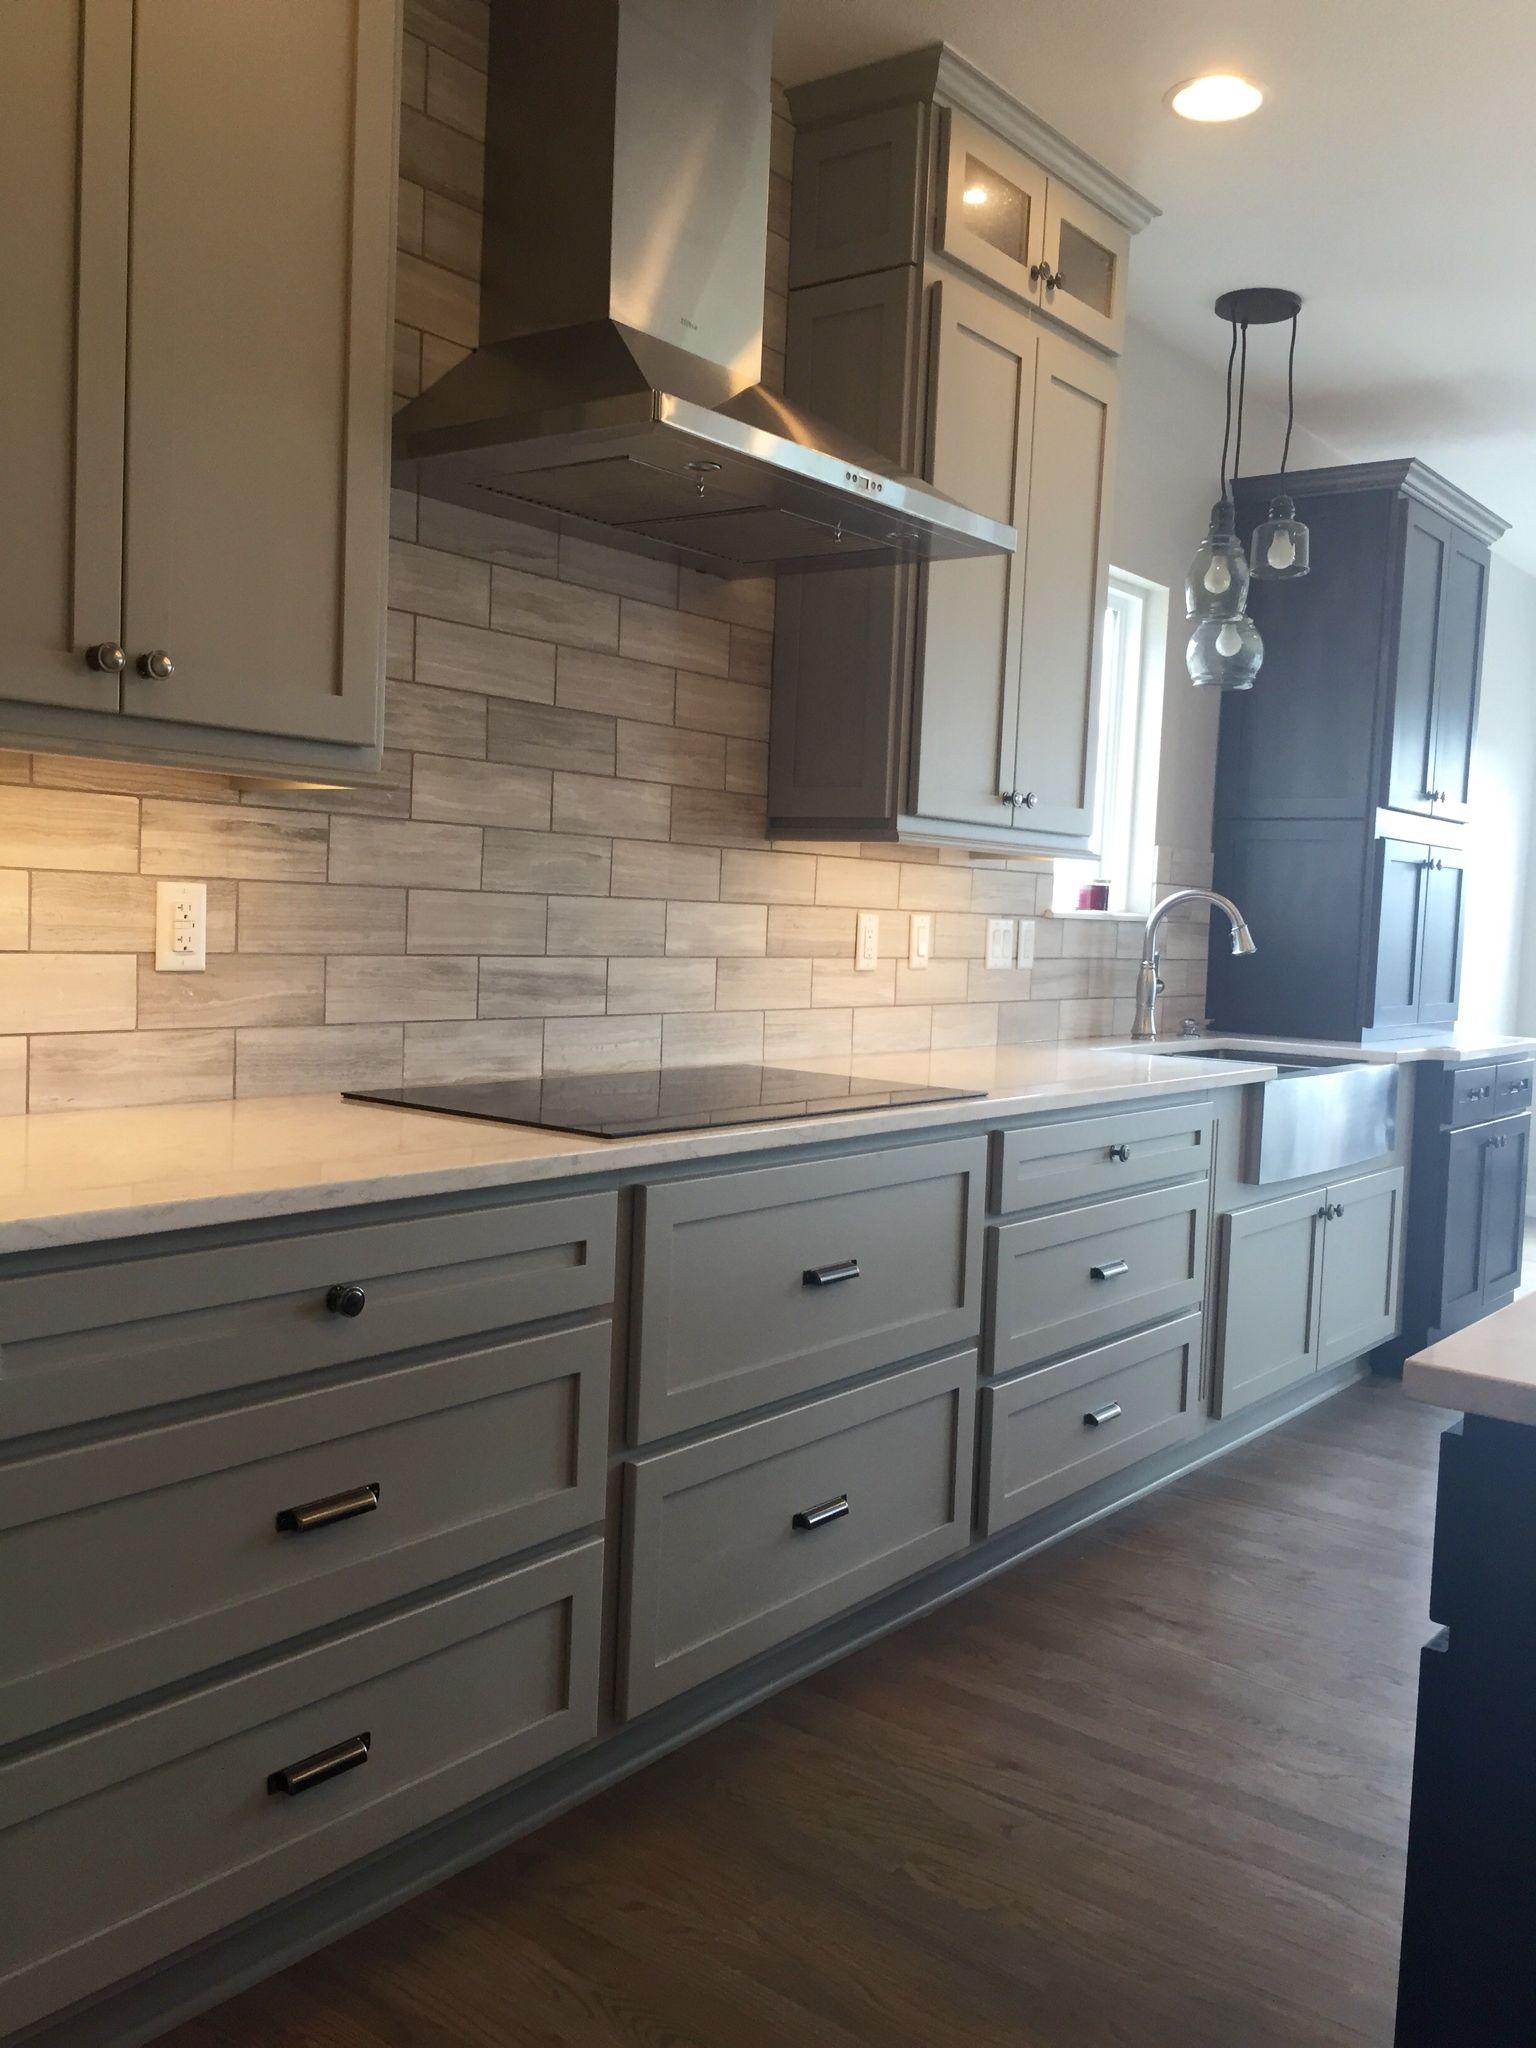 Grey Cabinetskitchen Remodelcolorado Kitchen And Bath Prepossessing Colorado Kitchen Design Decorating Inspiration